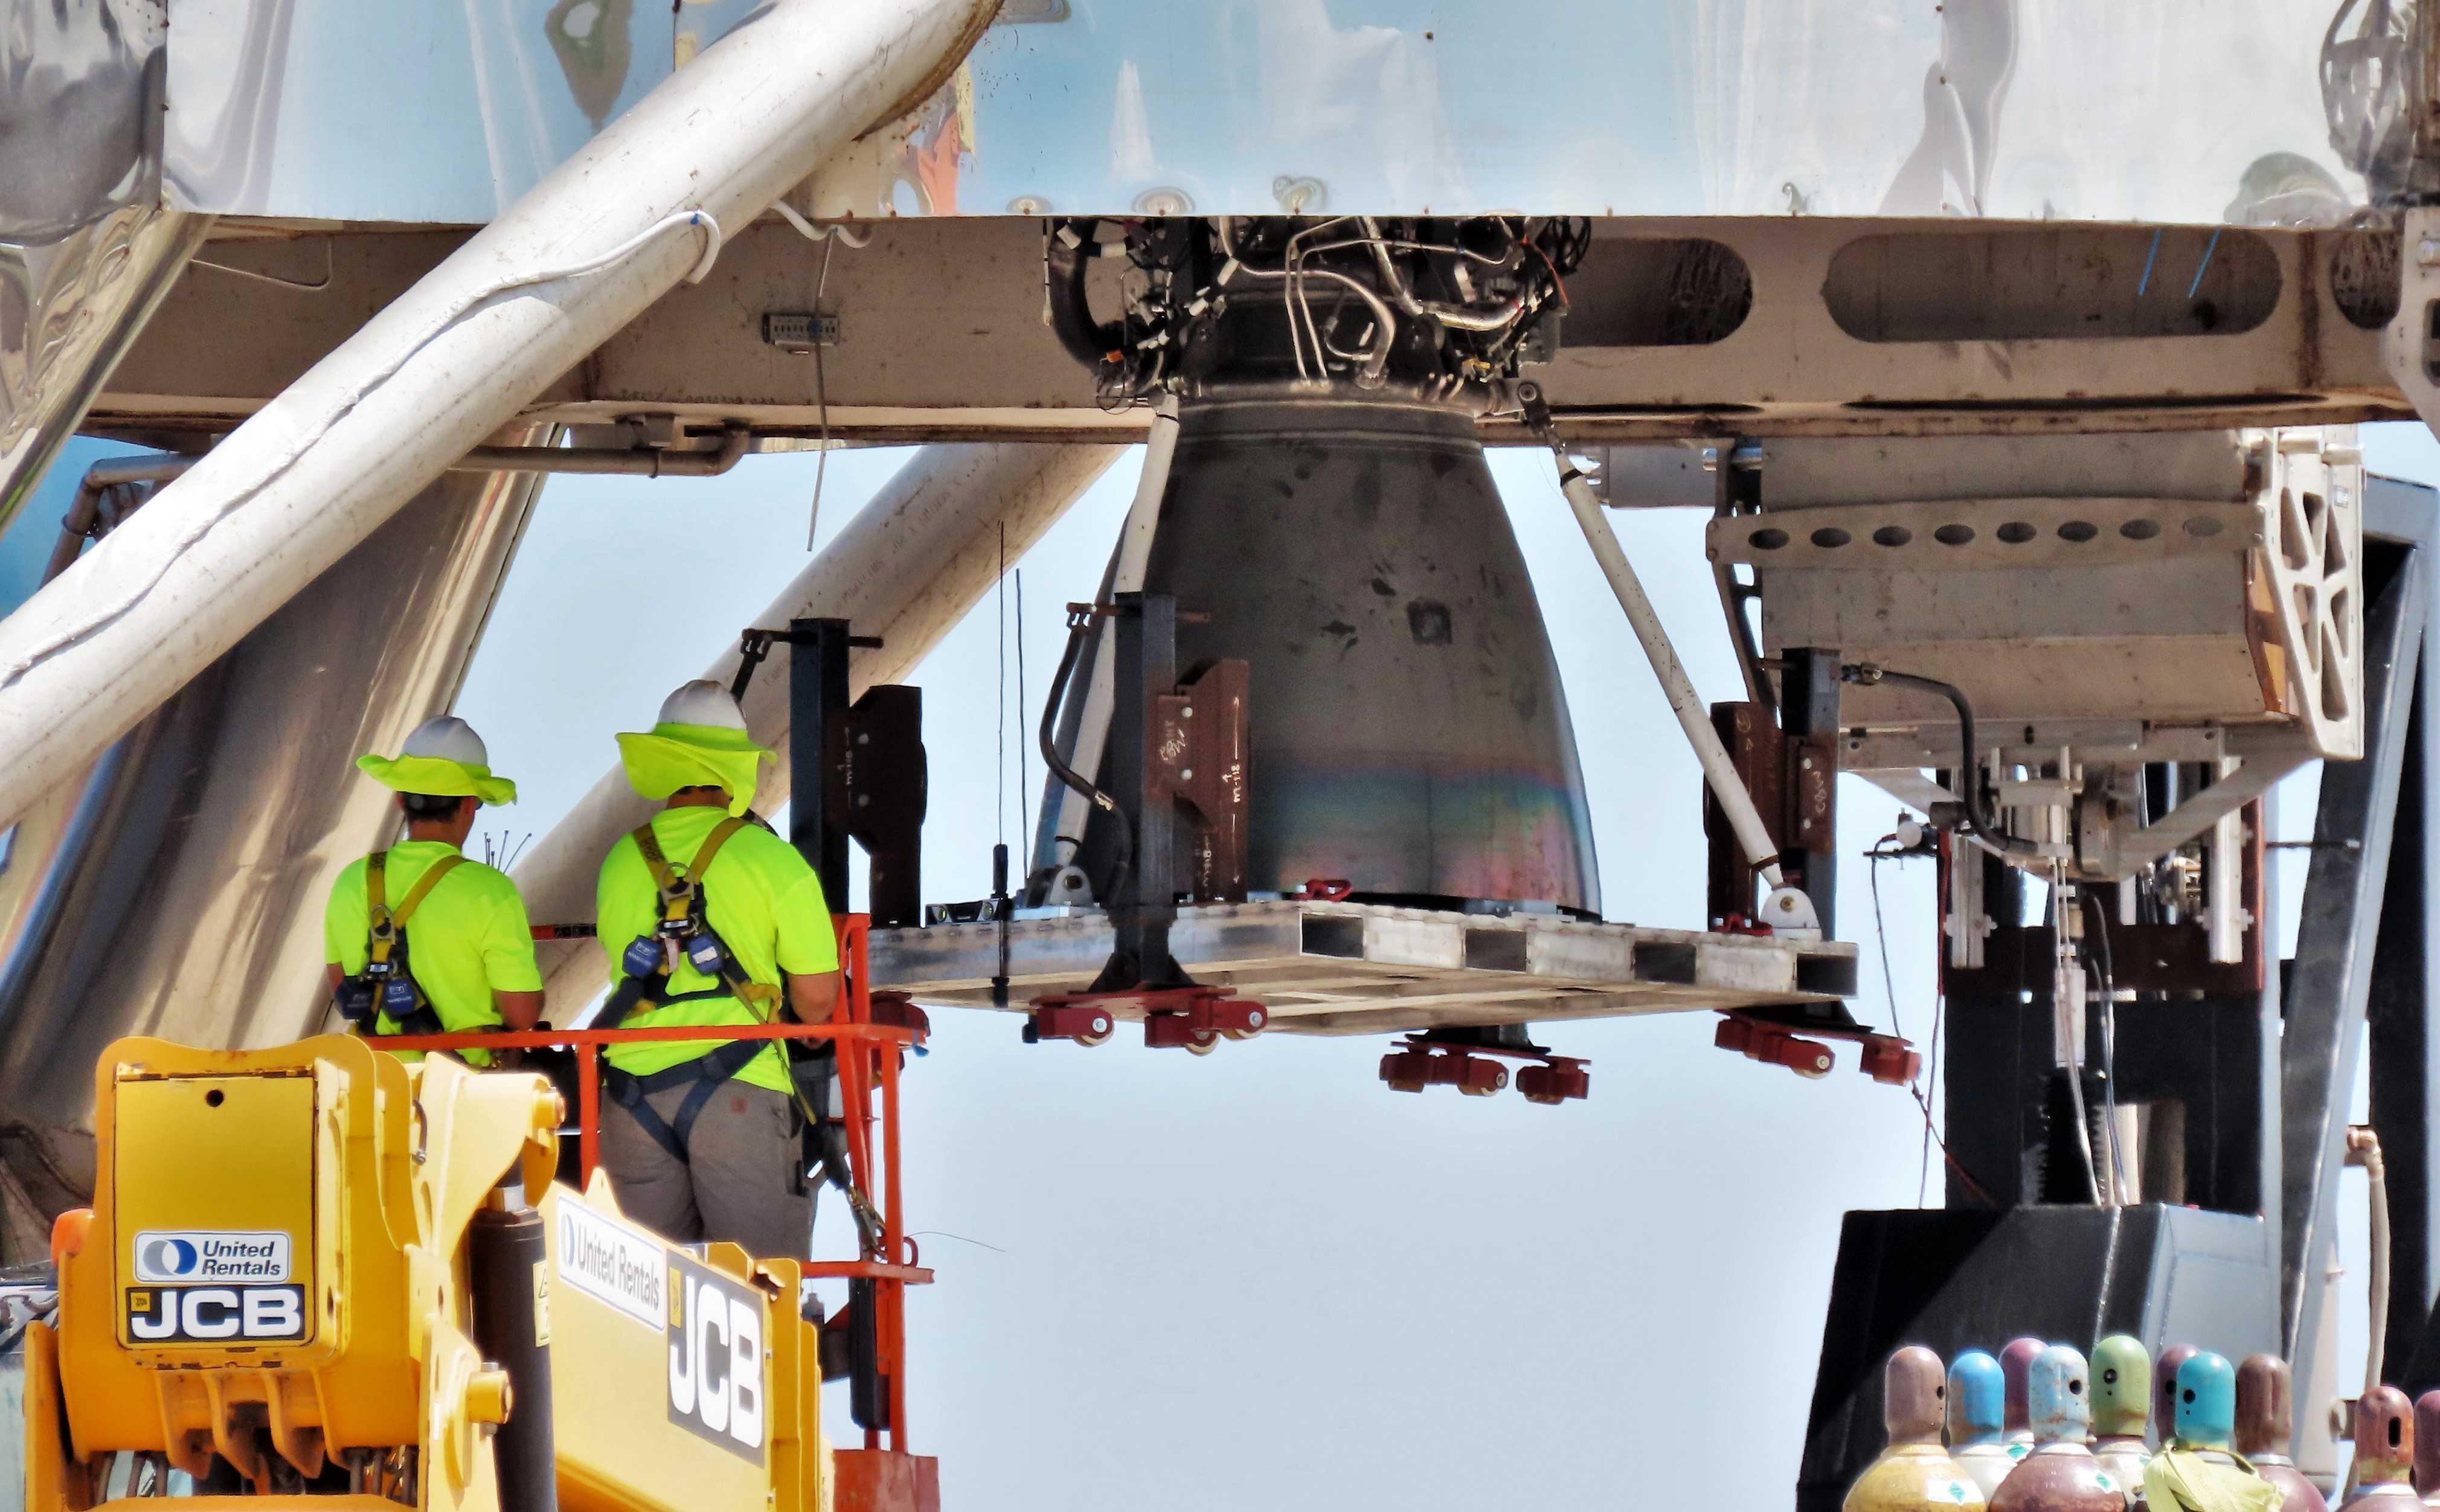 Boca Chica Starhopper Raptor SN04 installation 060219 (NASASpaceflight – bocachicagal) 2 (c)